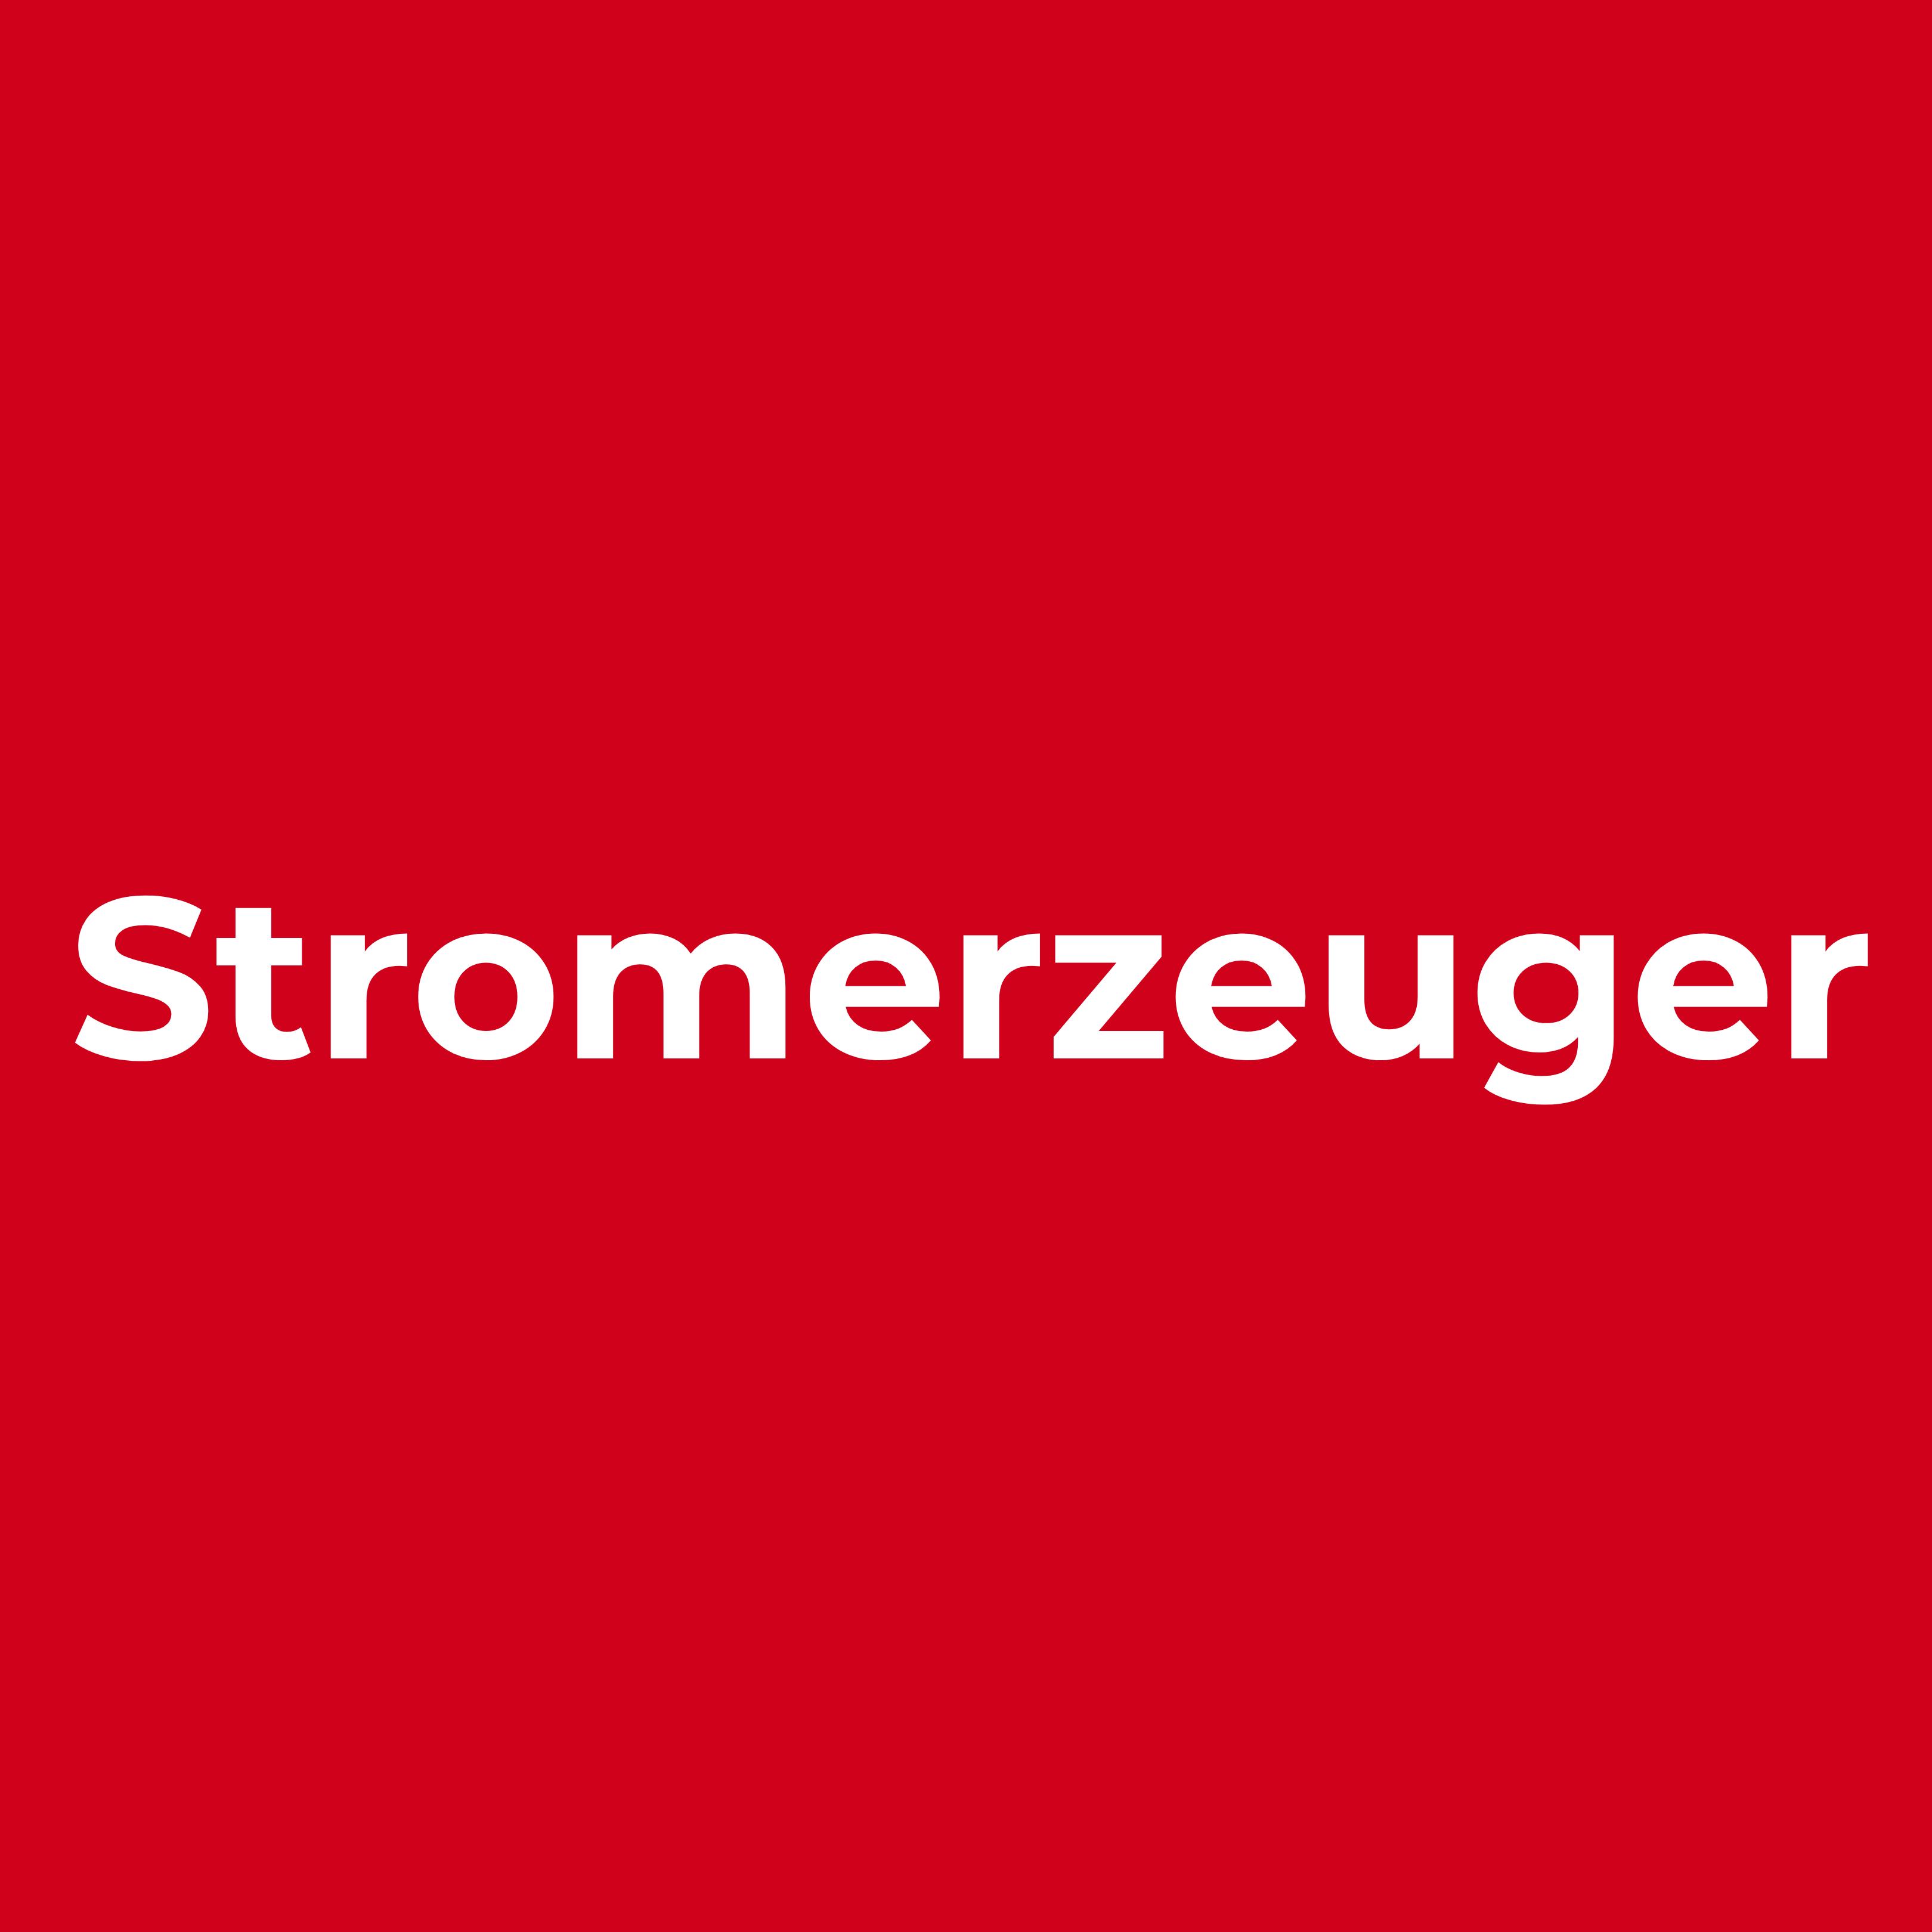 Kachel Stromerzeuger